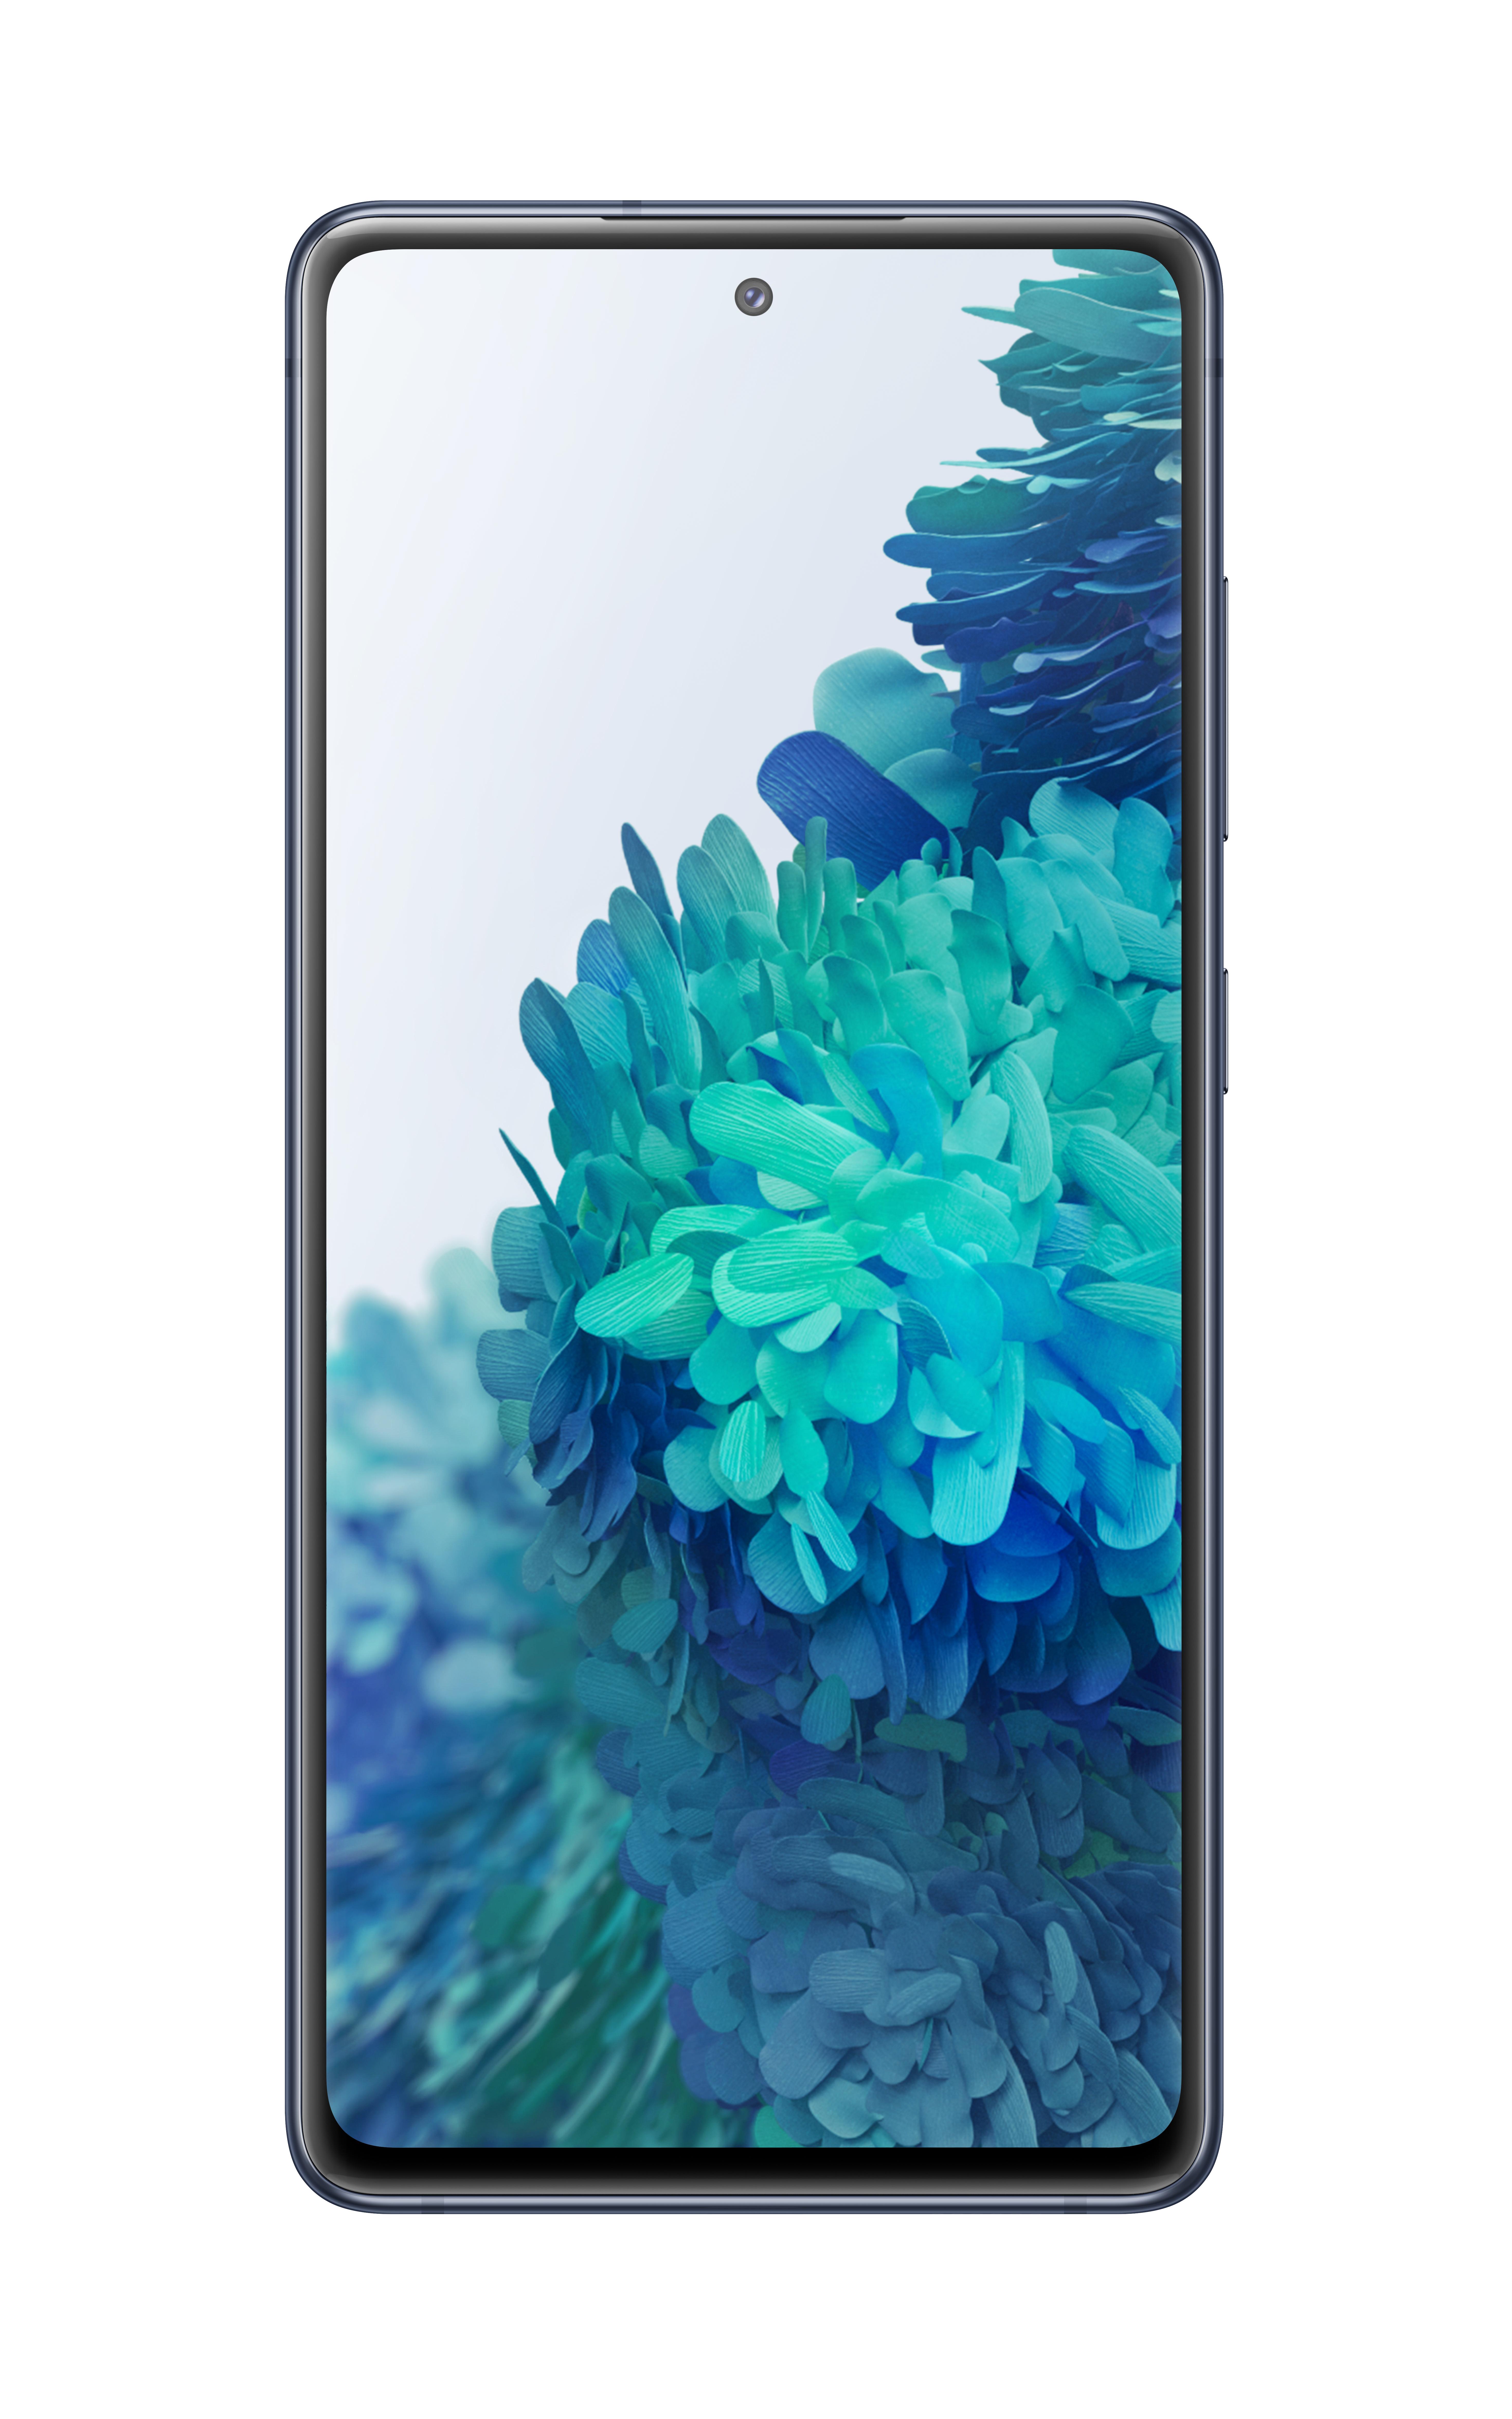 Vorschau: Samsung Galaxy S20 - Smartphone - 12 MP 128 GB - Blau